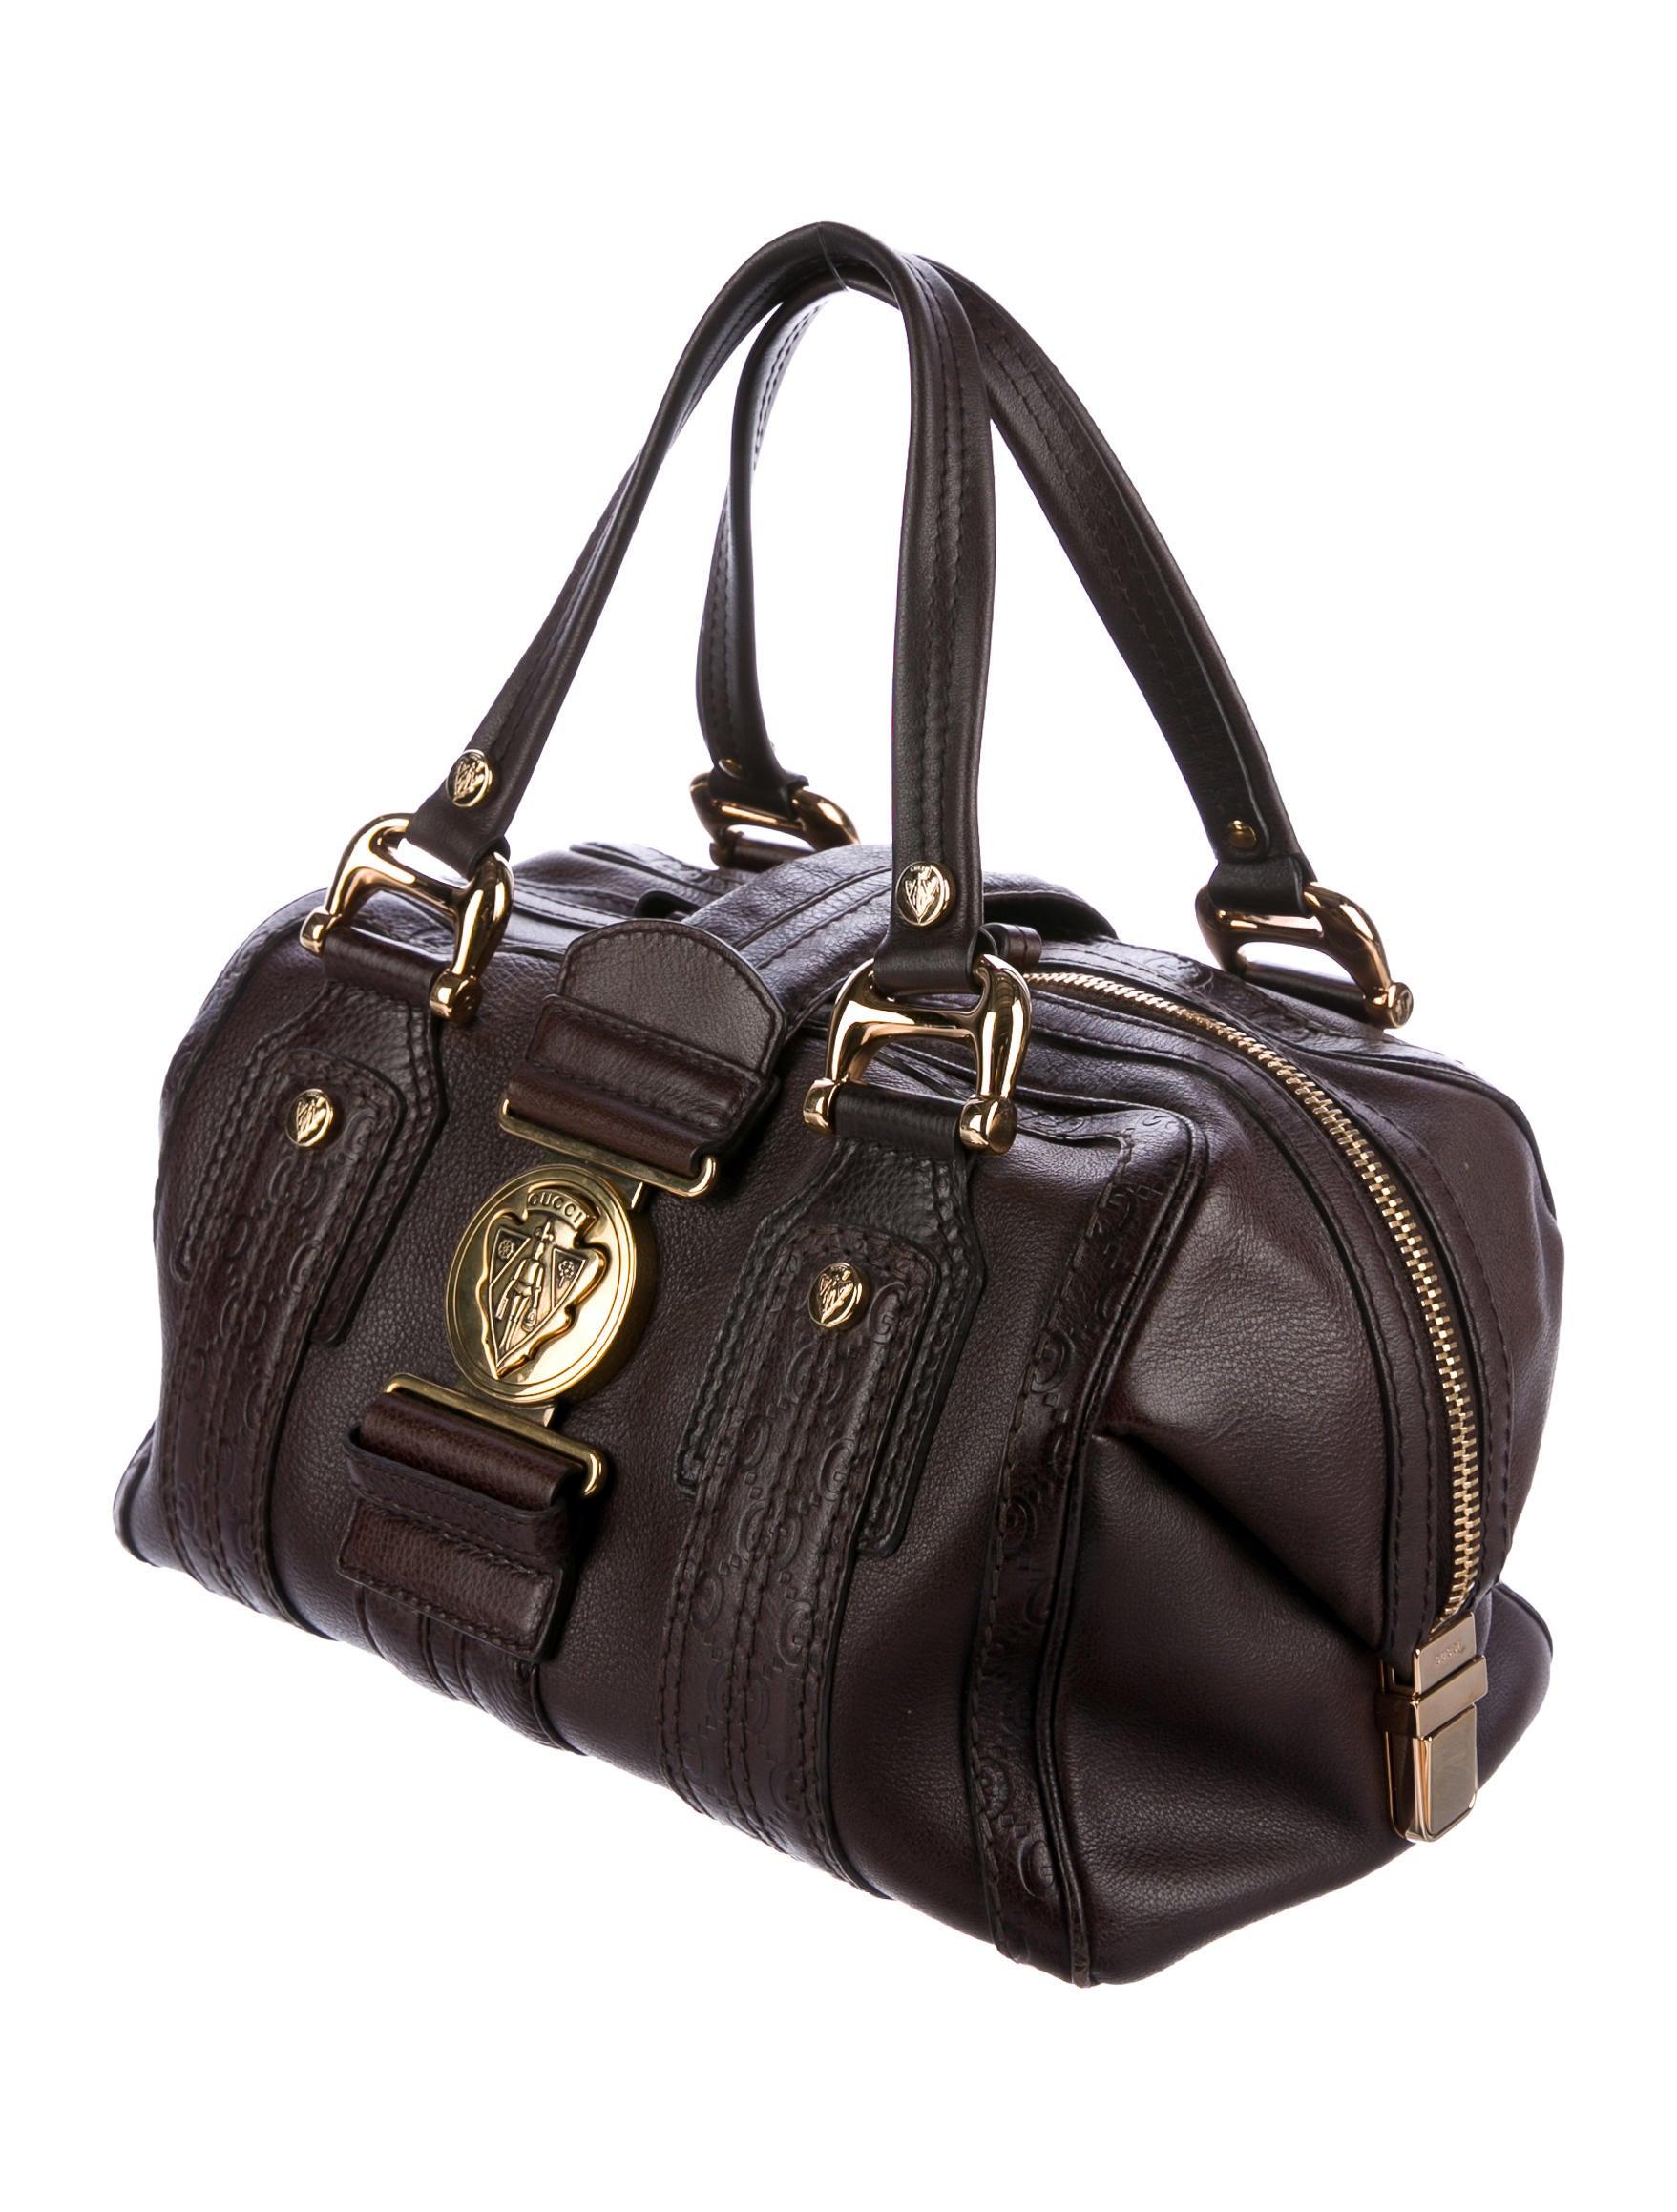 Boston Bag Patchwork Tutorial: Gucci Medium Aviatrix Boston Bag